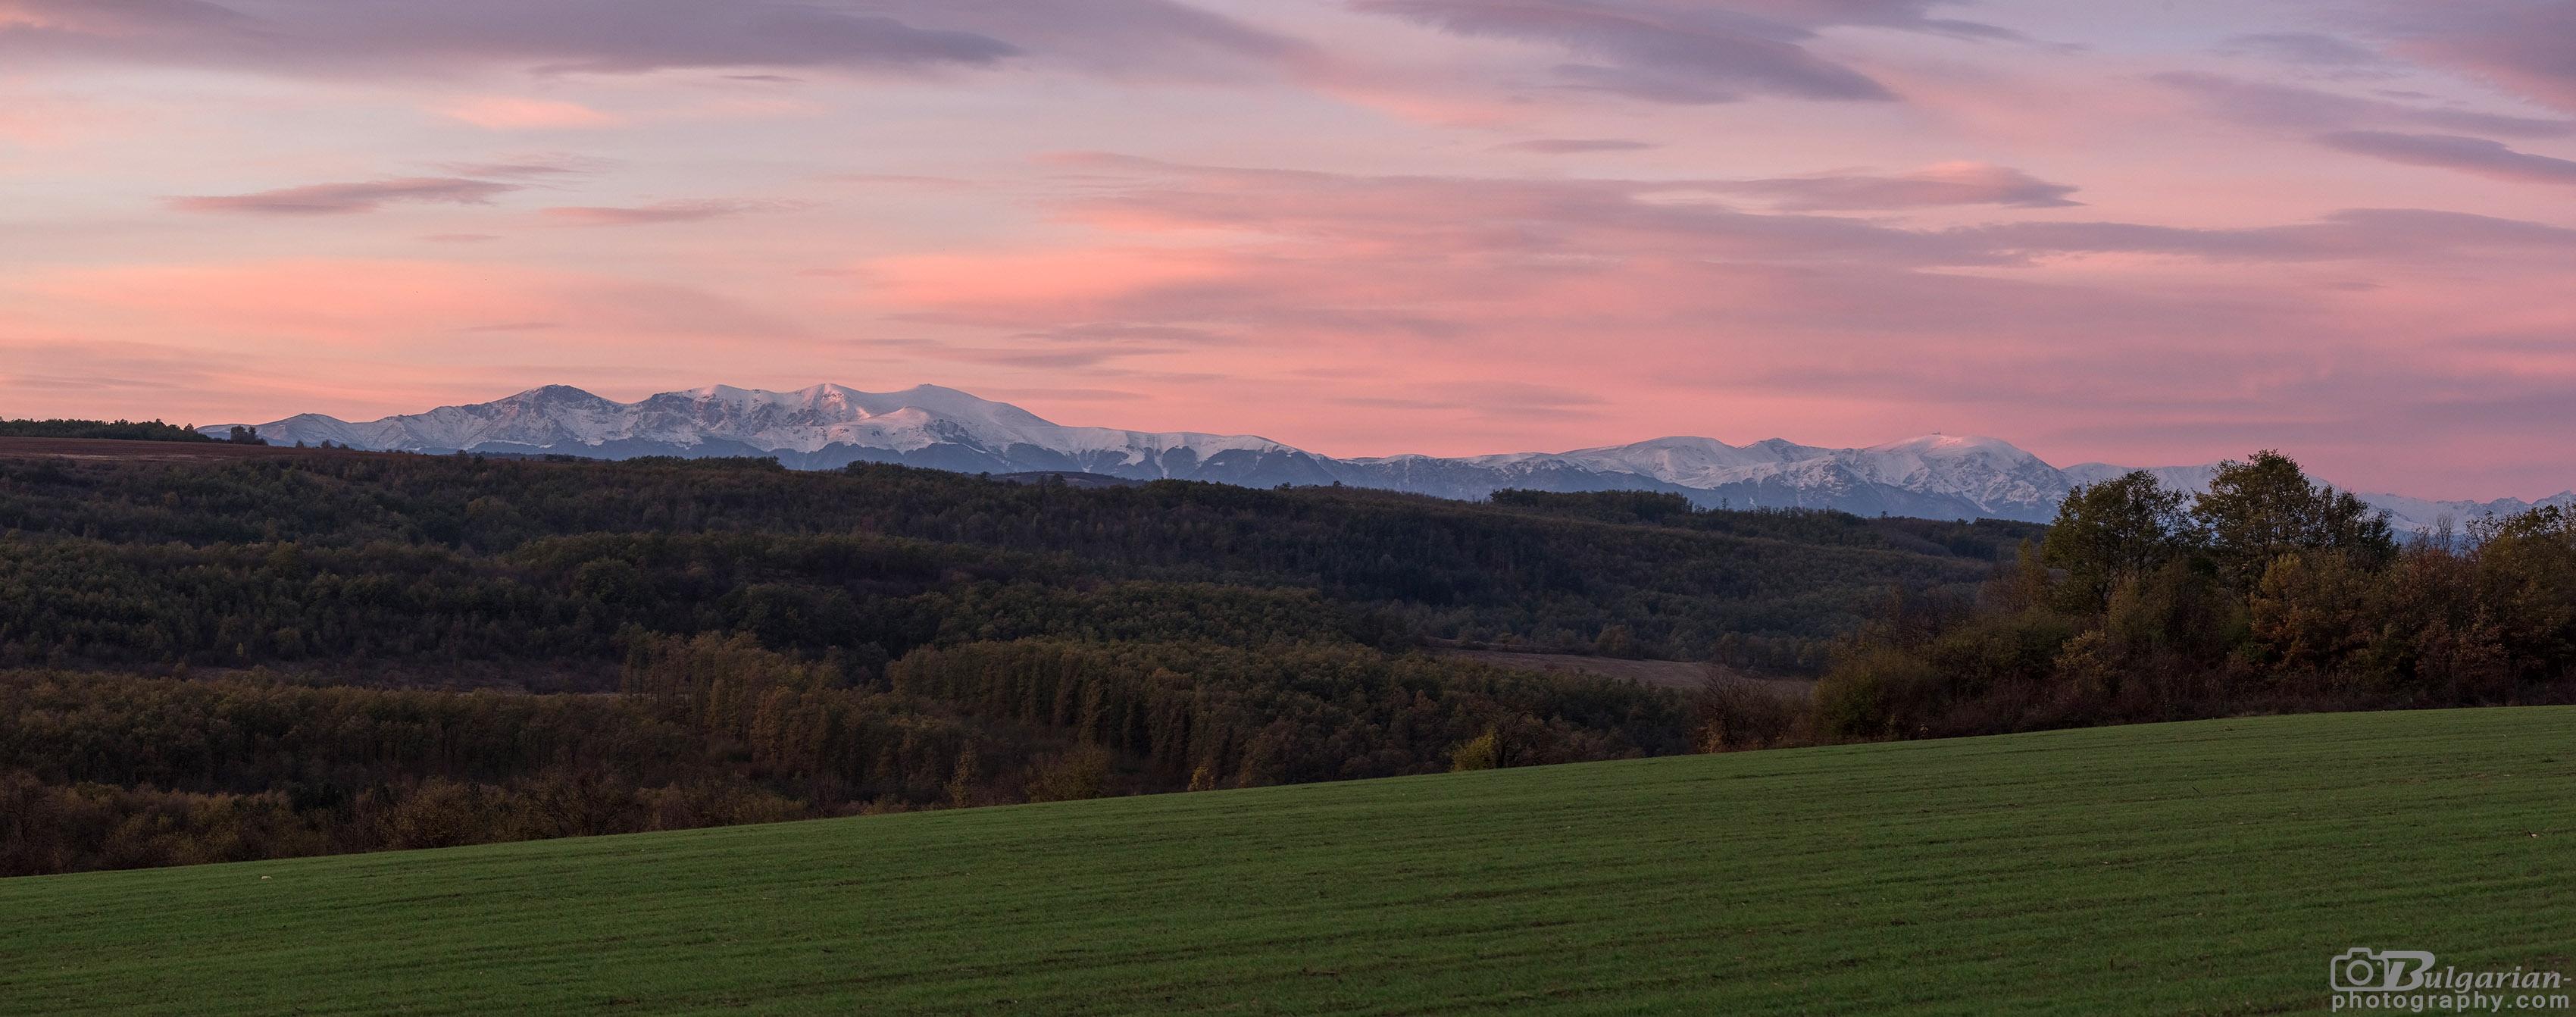 Central Stara Planina in late autumn